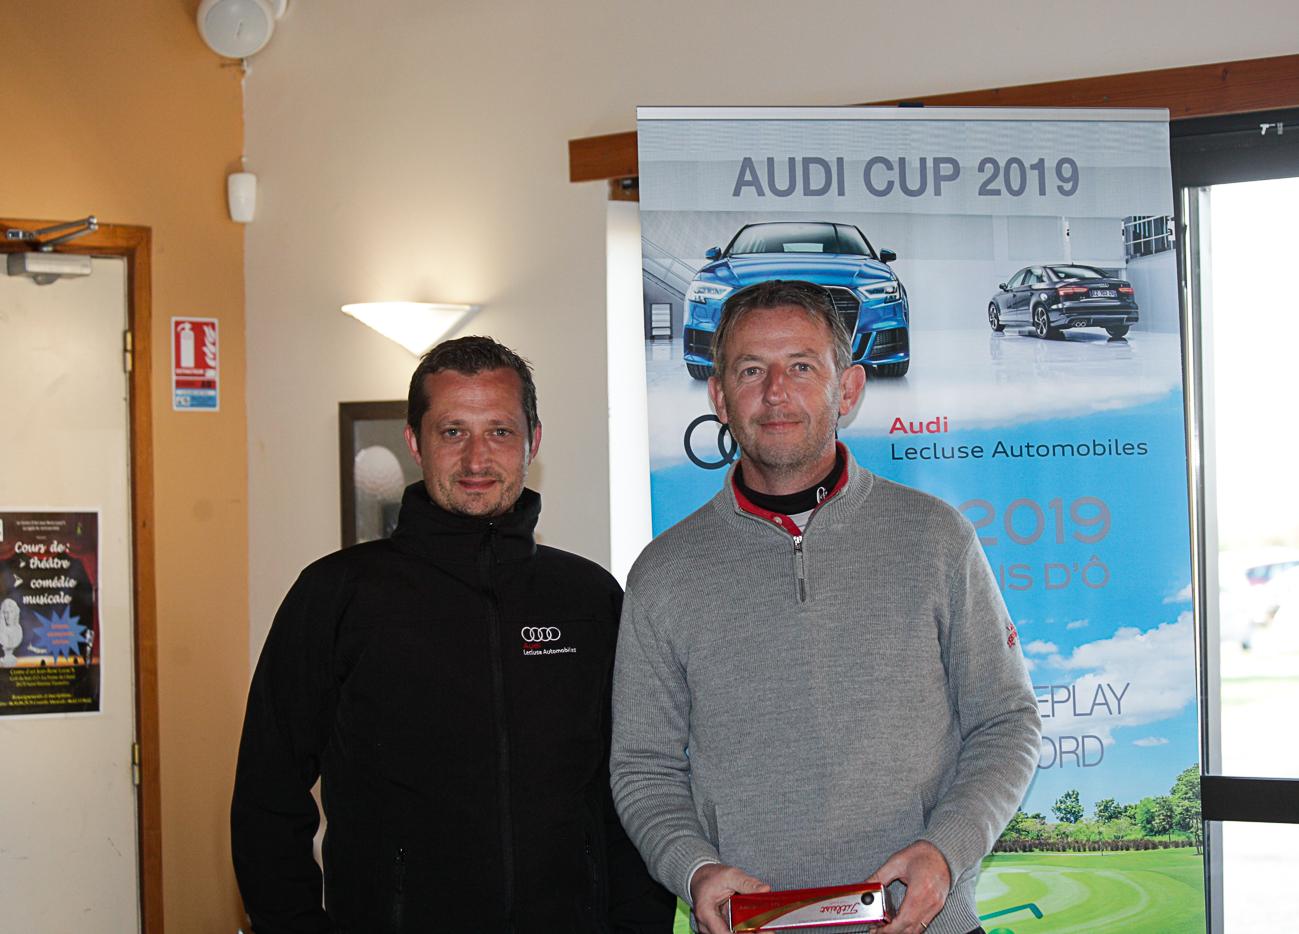 AUDI-CUP-2019-1-32